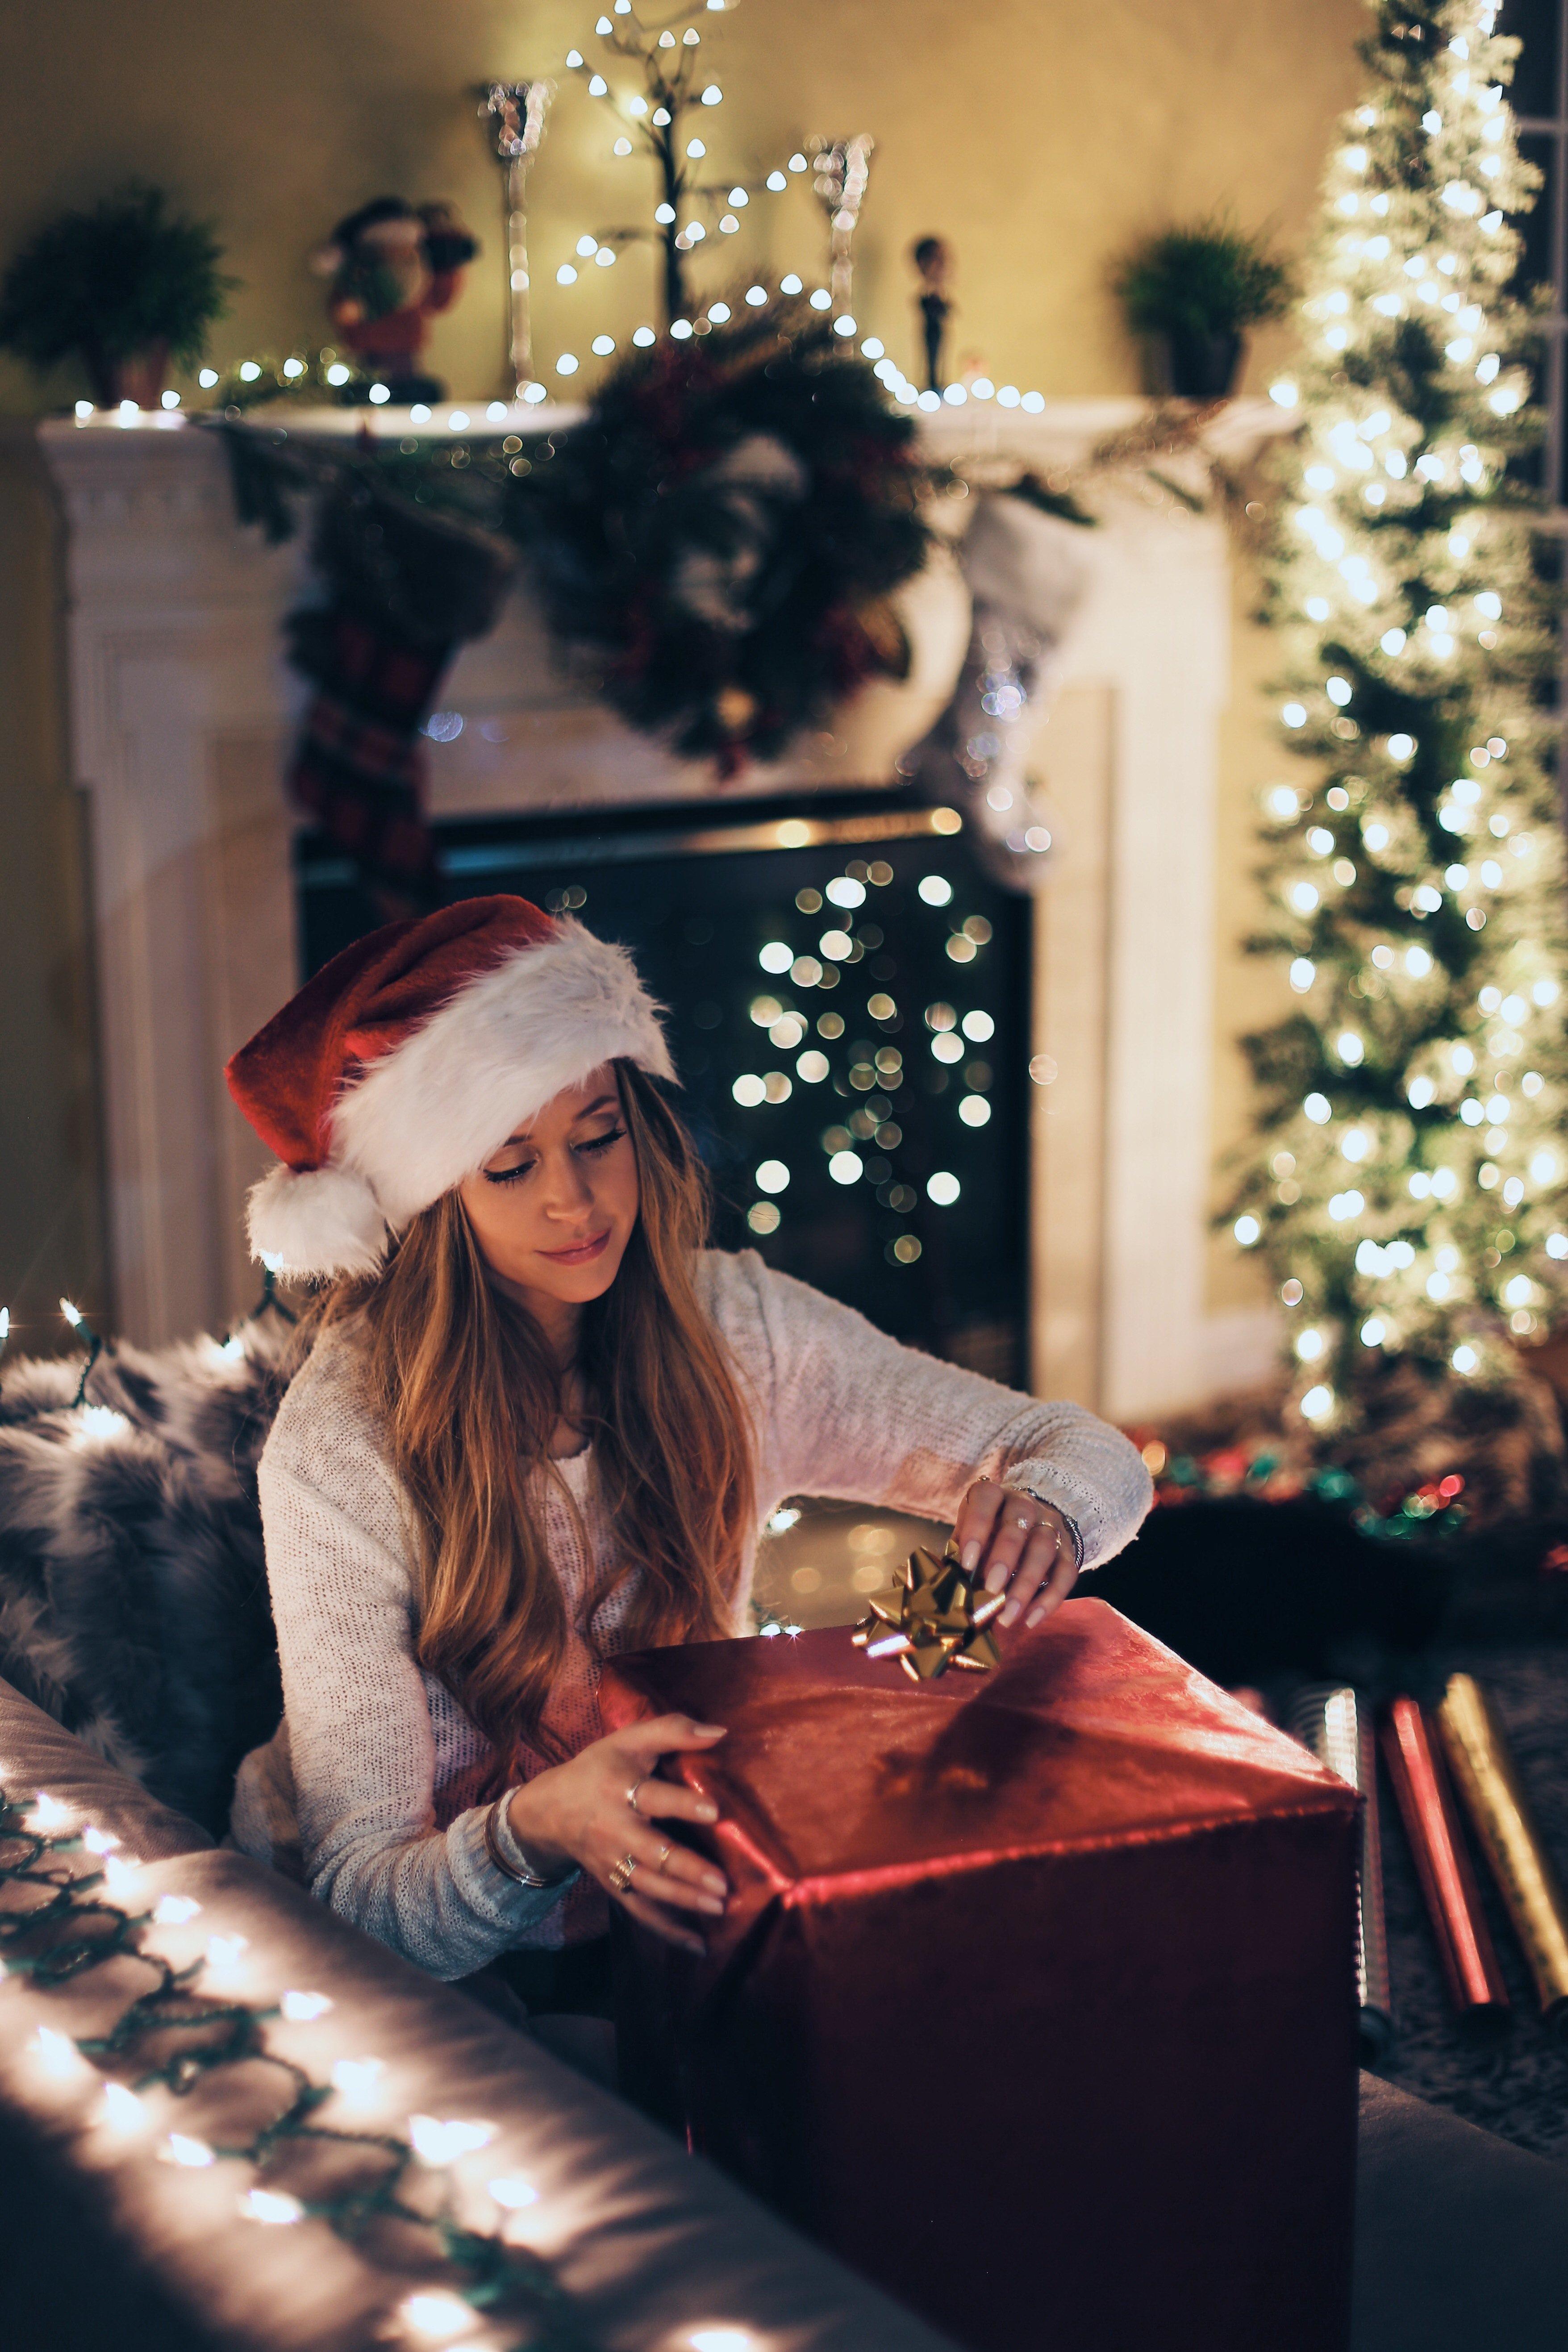 Get Your Blog Through The Festive Season